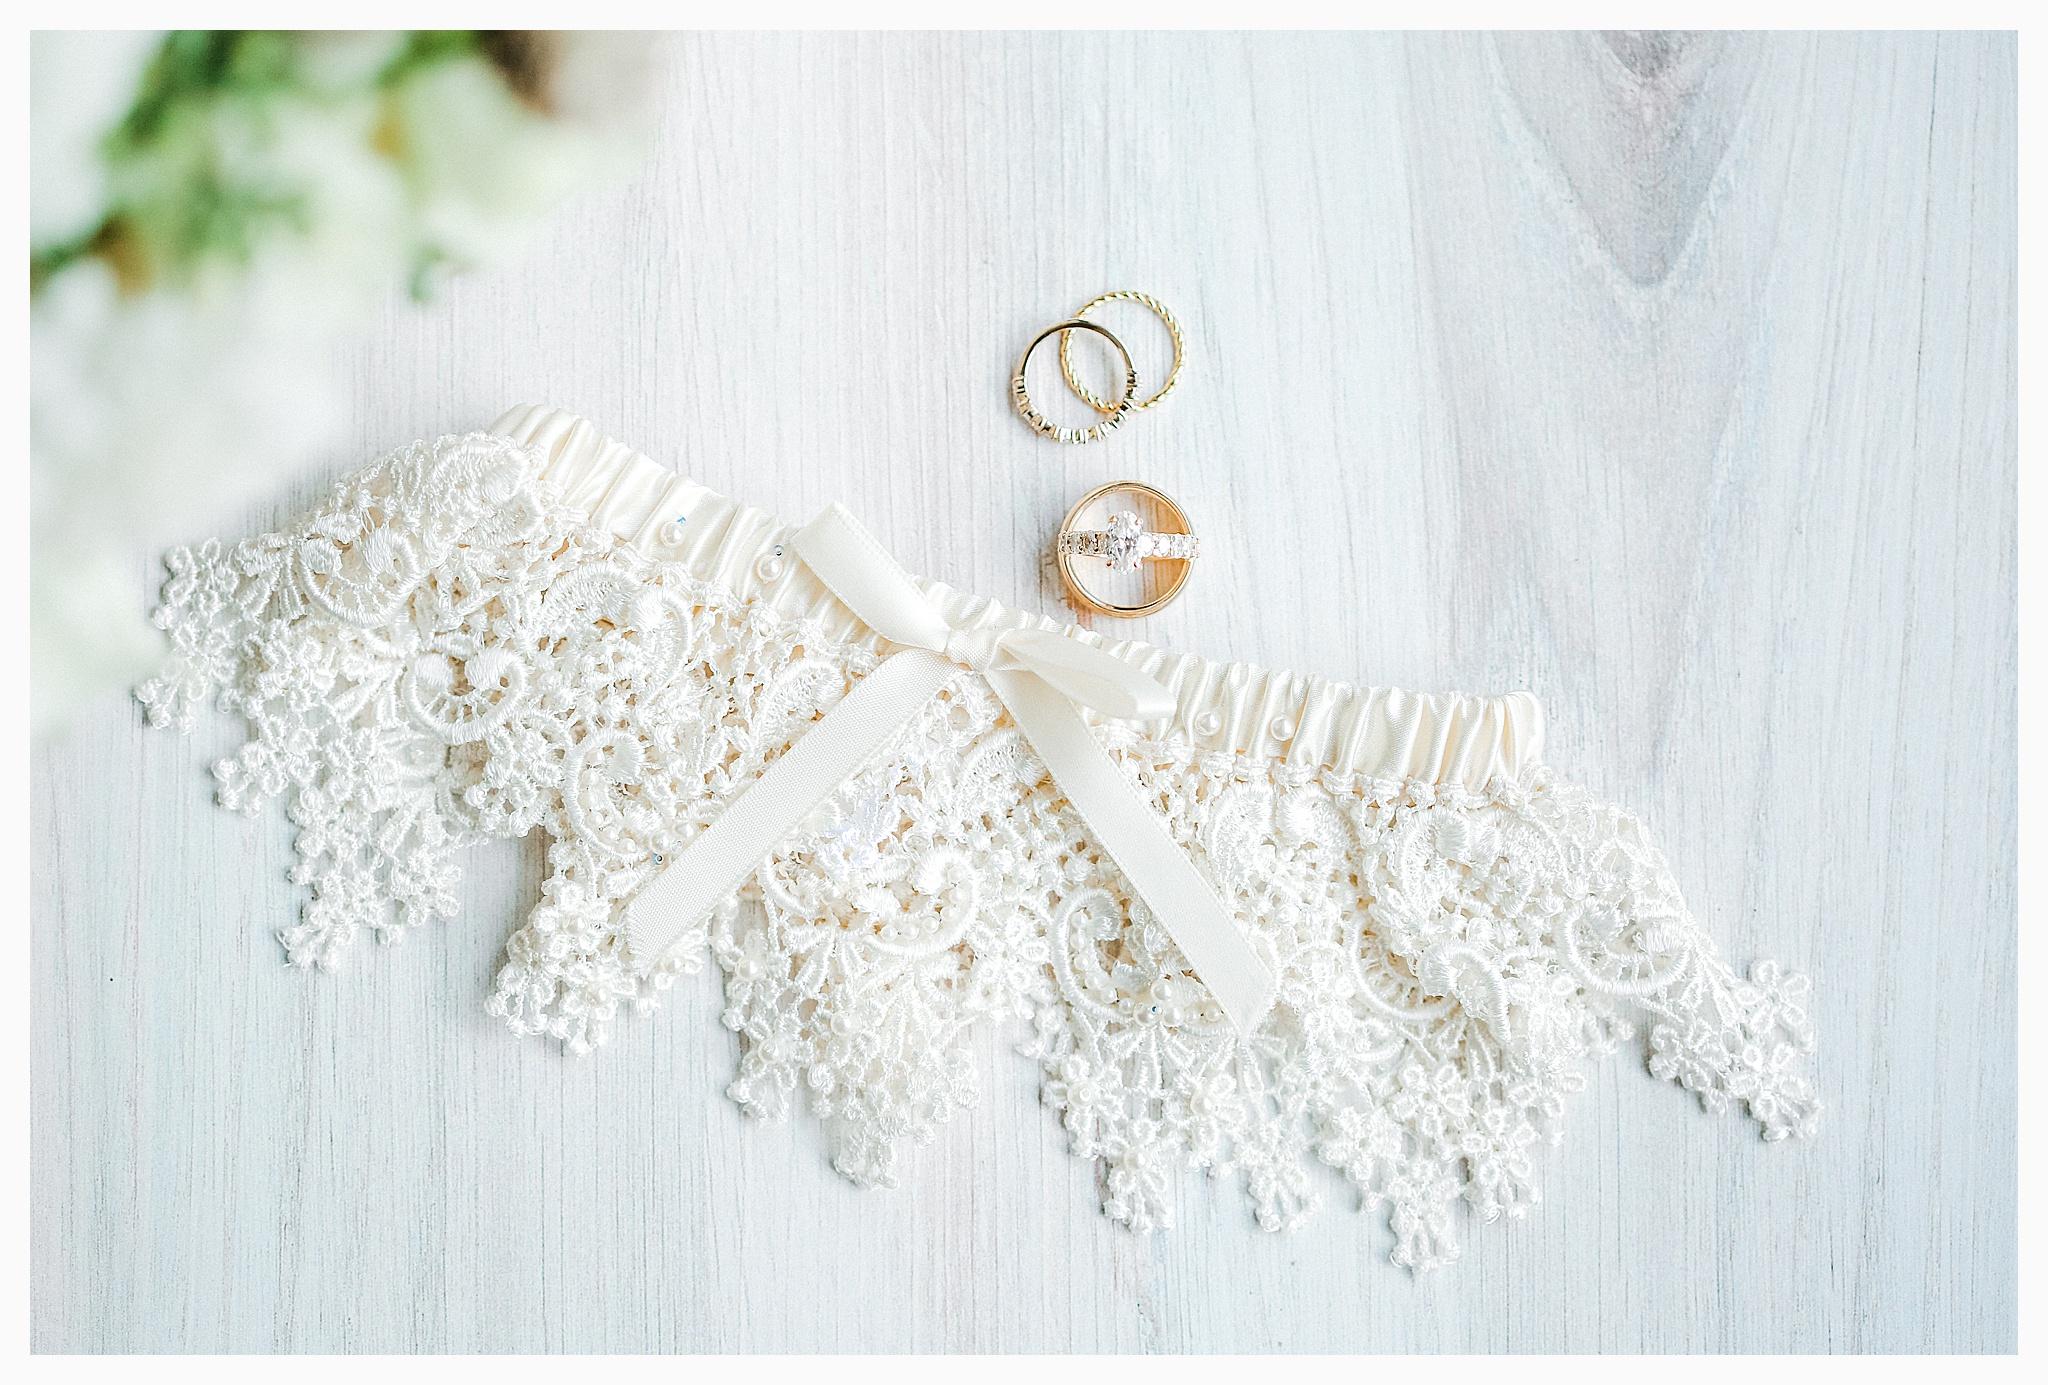 Emma Rose Company Light and Airy Wedding Photographer, Beautiful fall wedding at Rock Creek Gardens Venue in Puyallup, Washington._0008.jpg